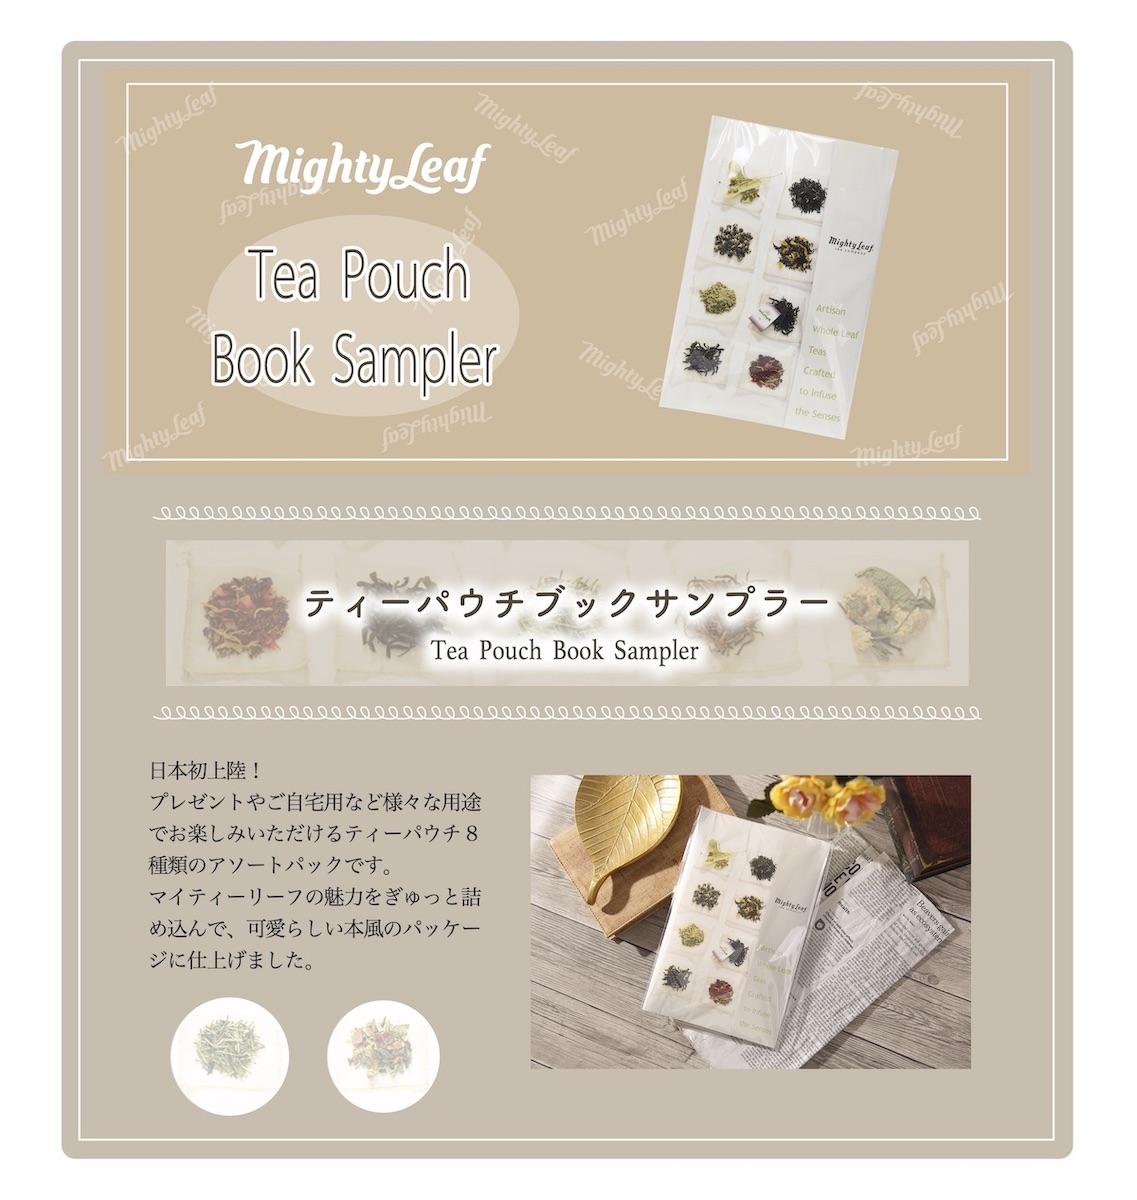 Tea Pouch Book Sampler